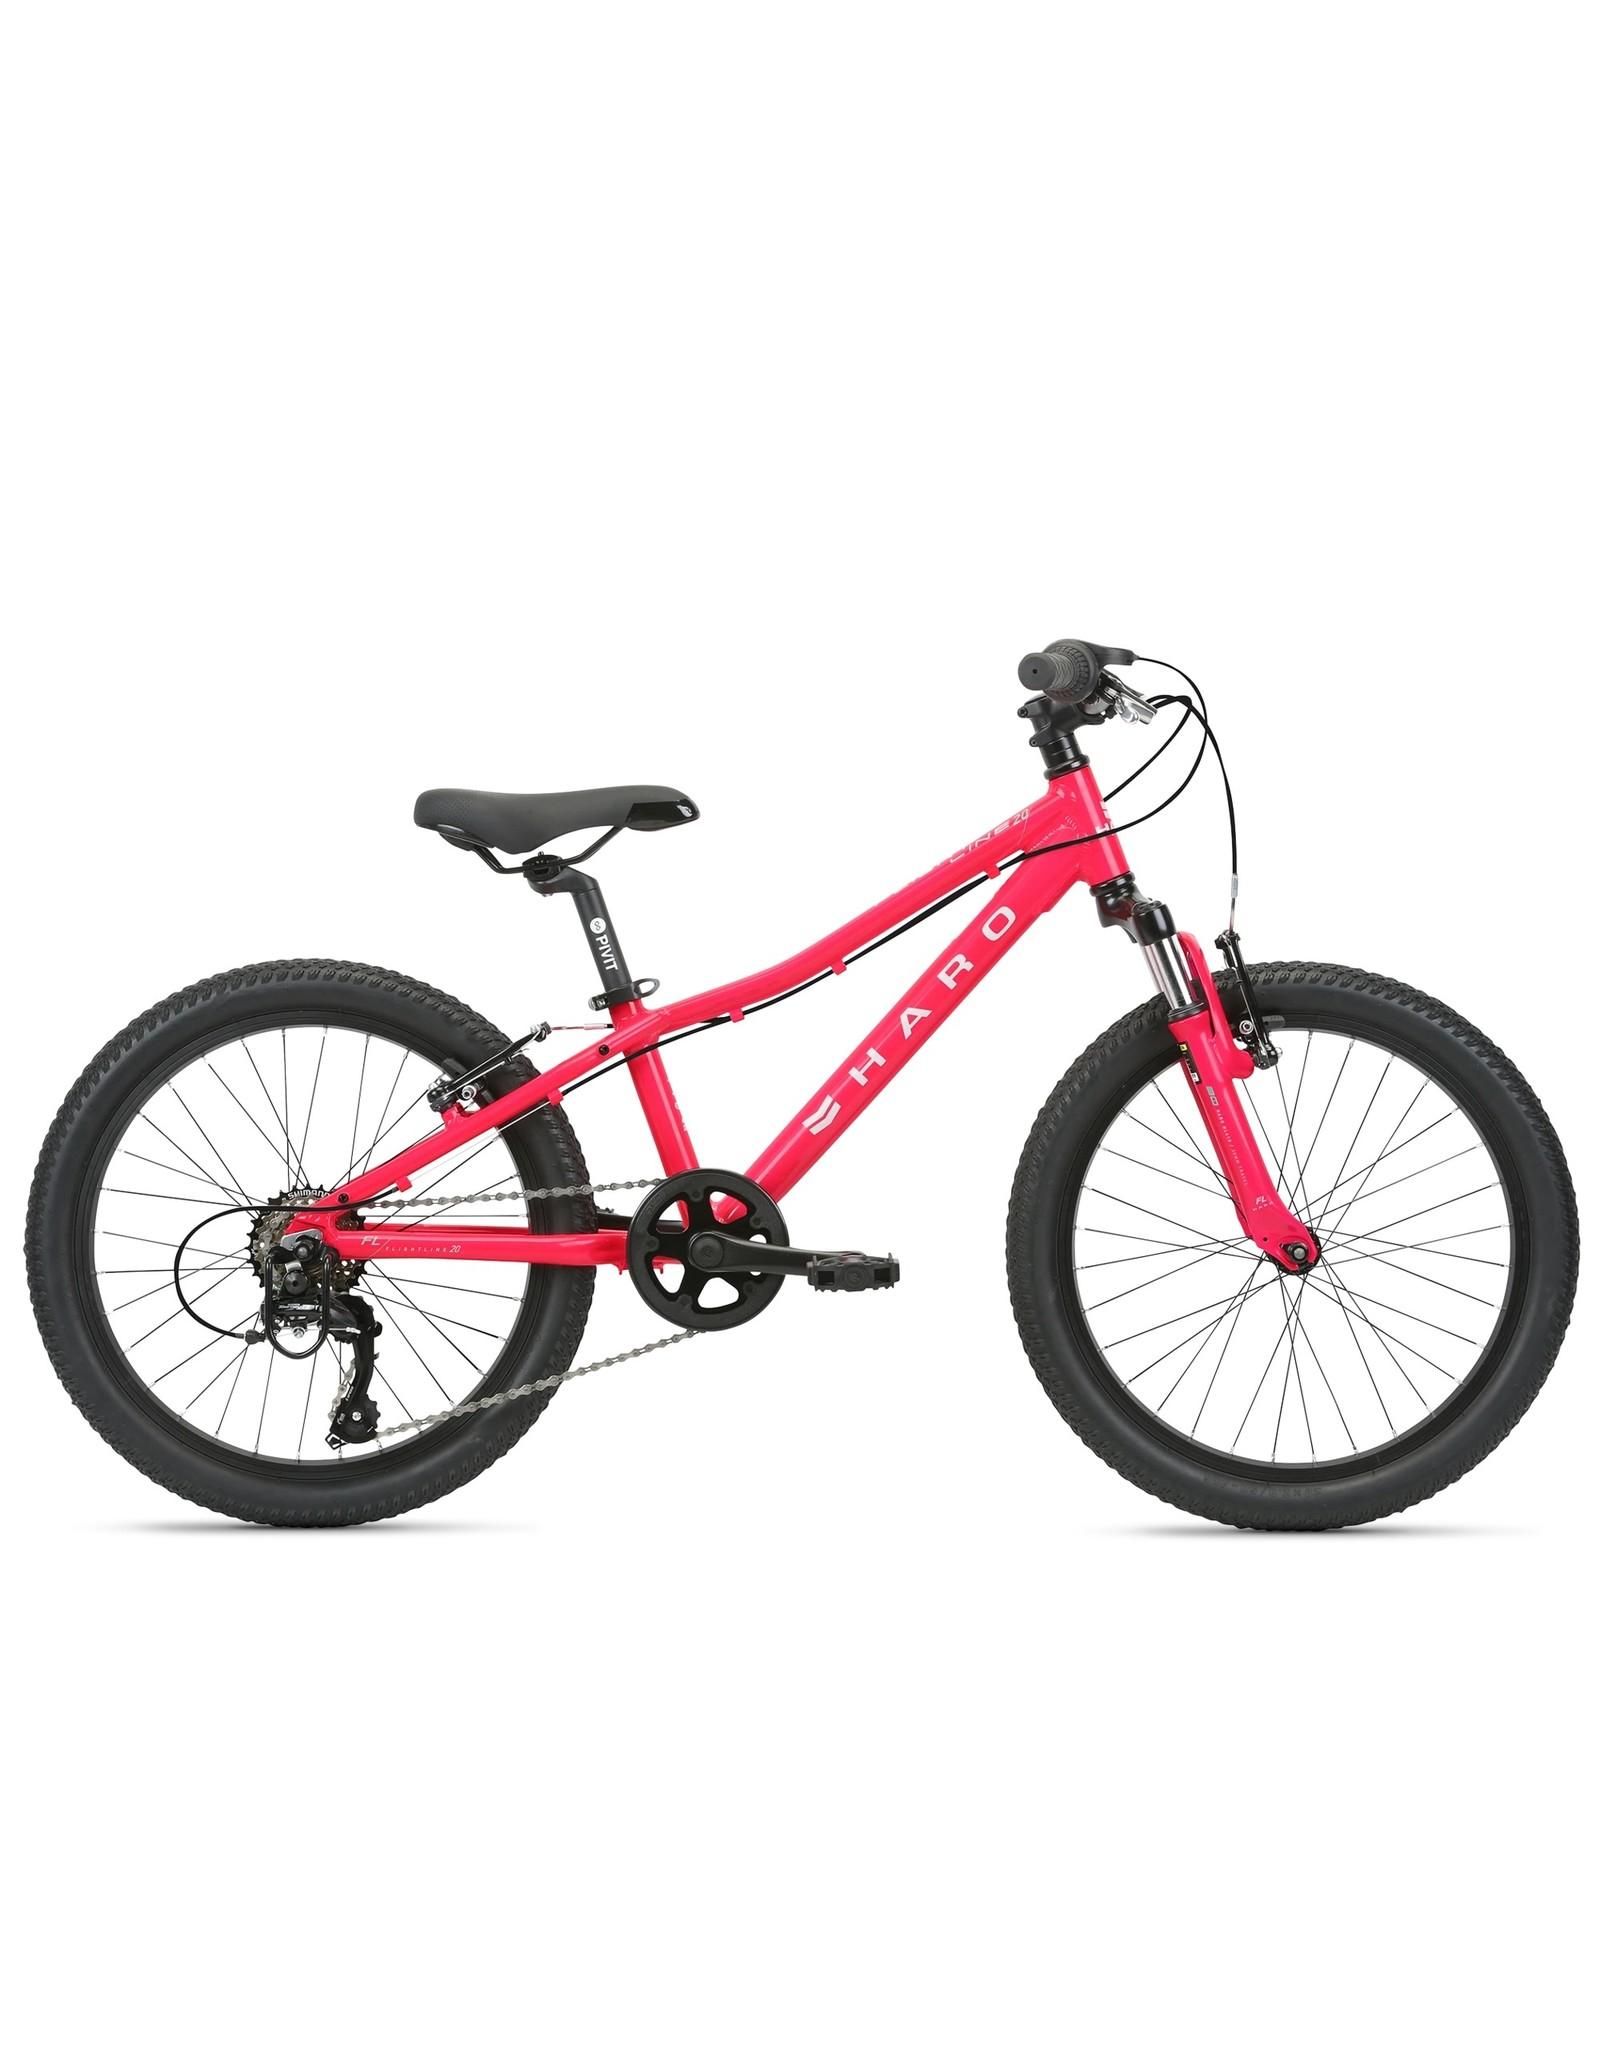 Haro Bikes 21 Haro FL 20 Magenta/White